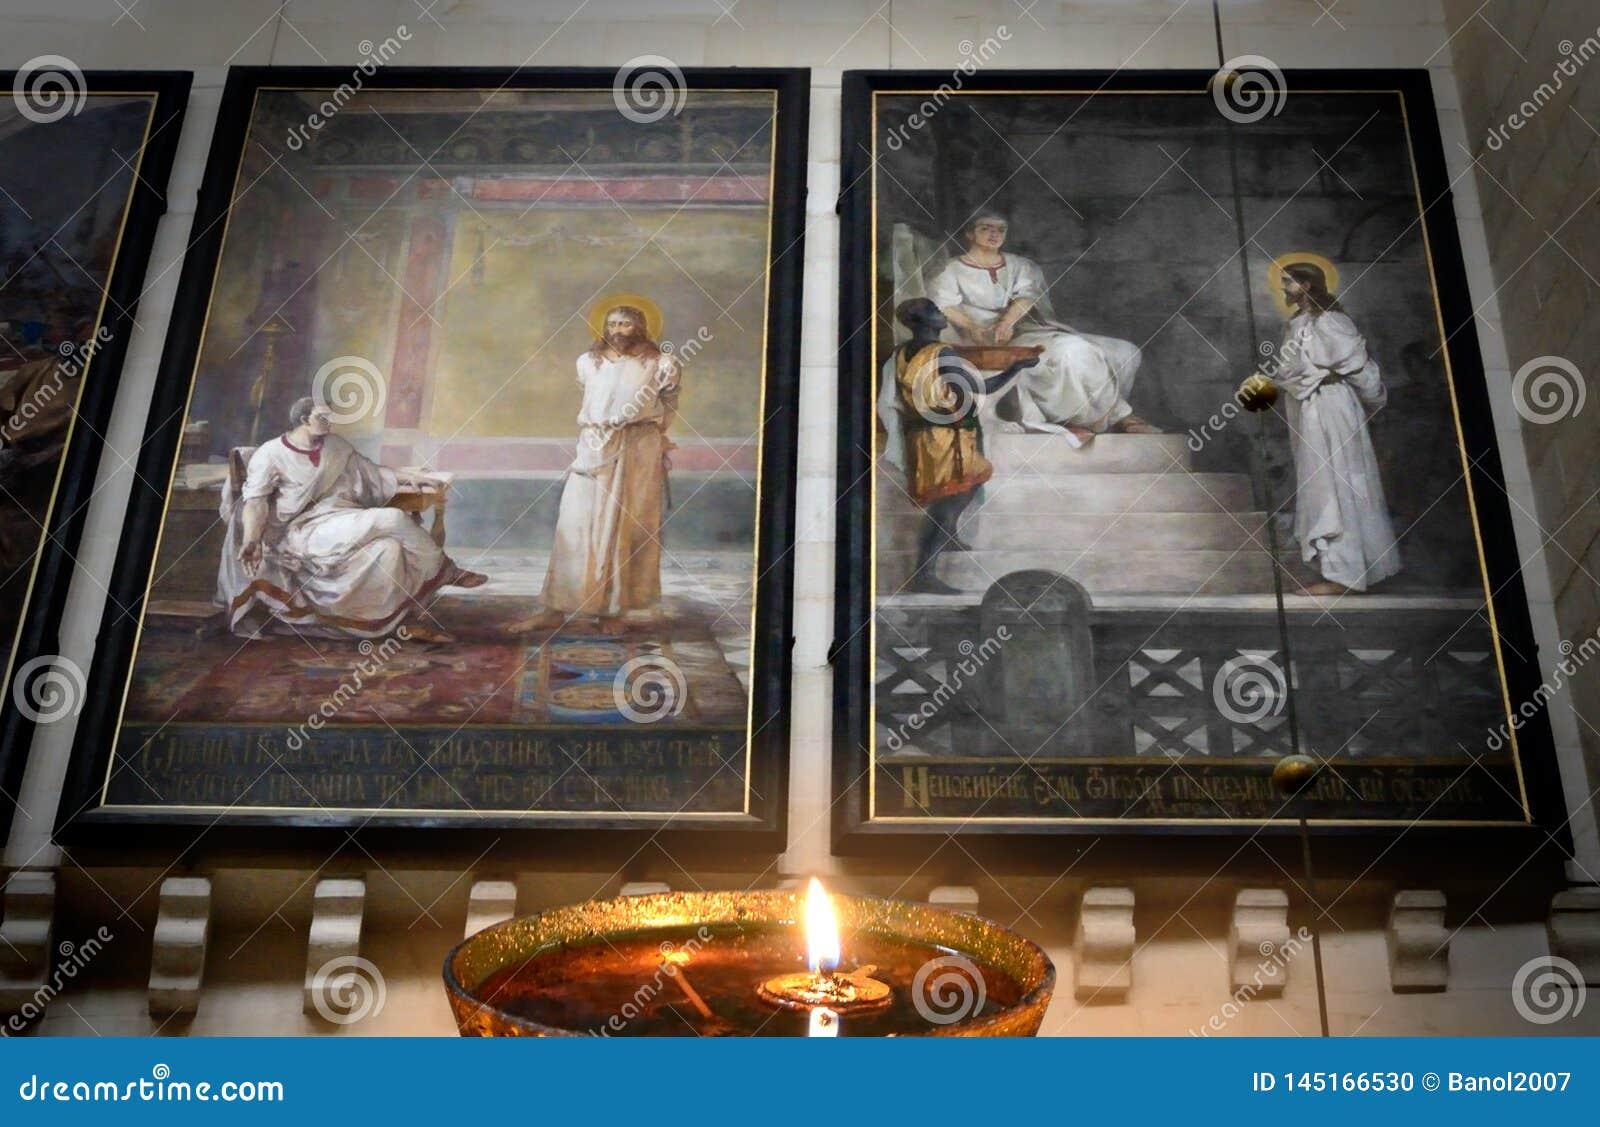 Jesus, Herod, P Pilatus Noite das experimenta??es senten?a